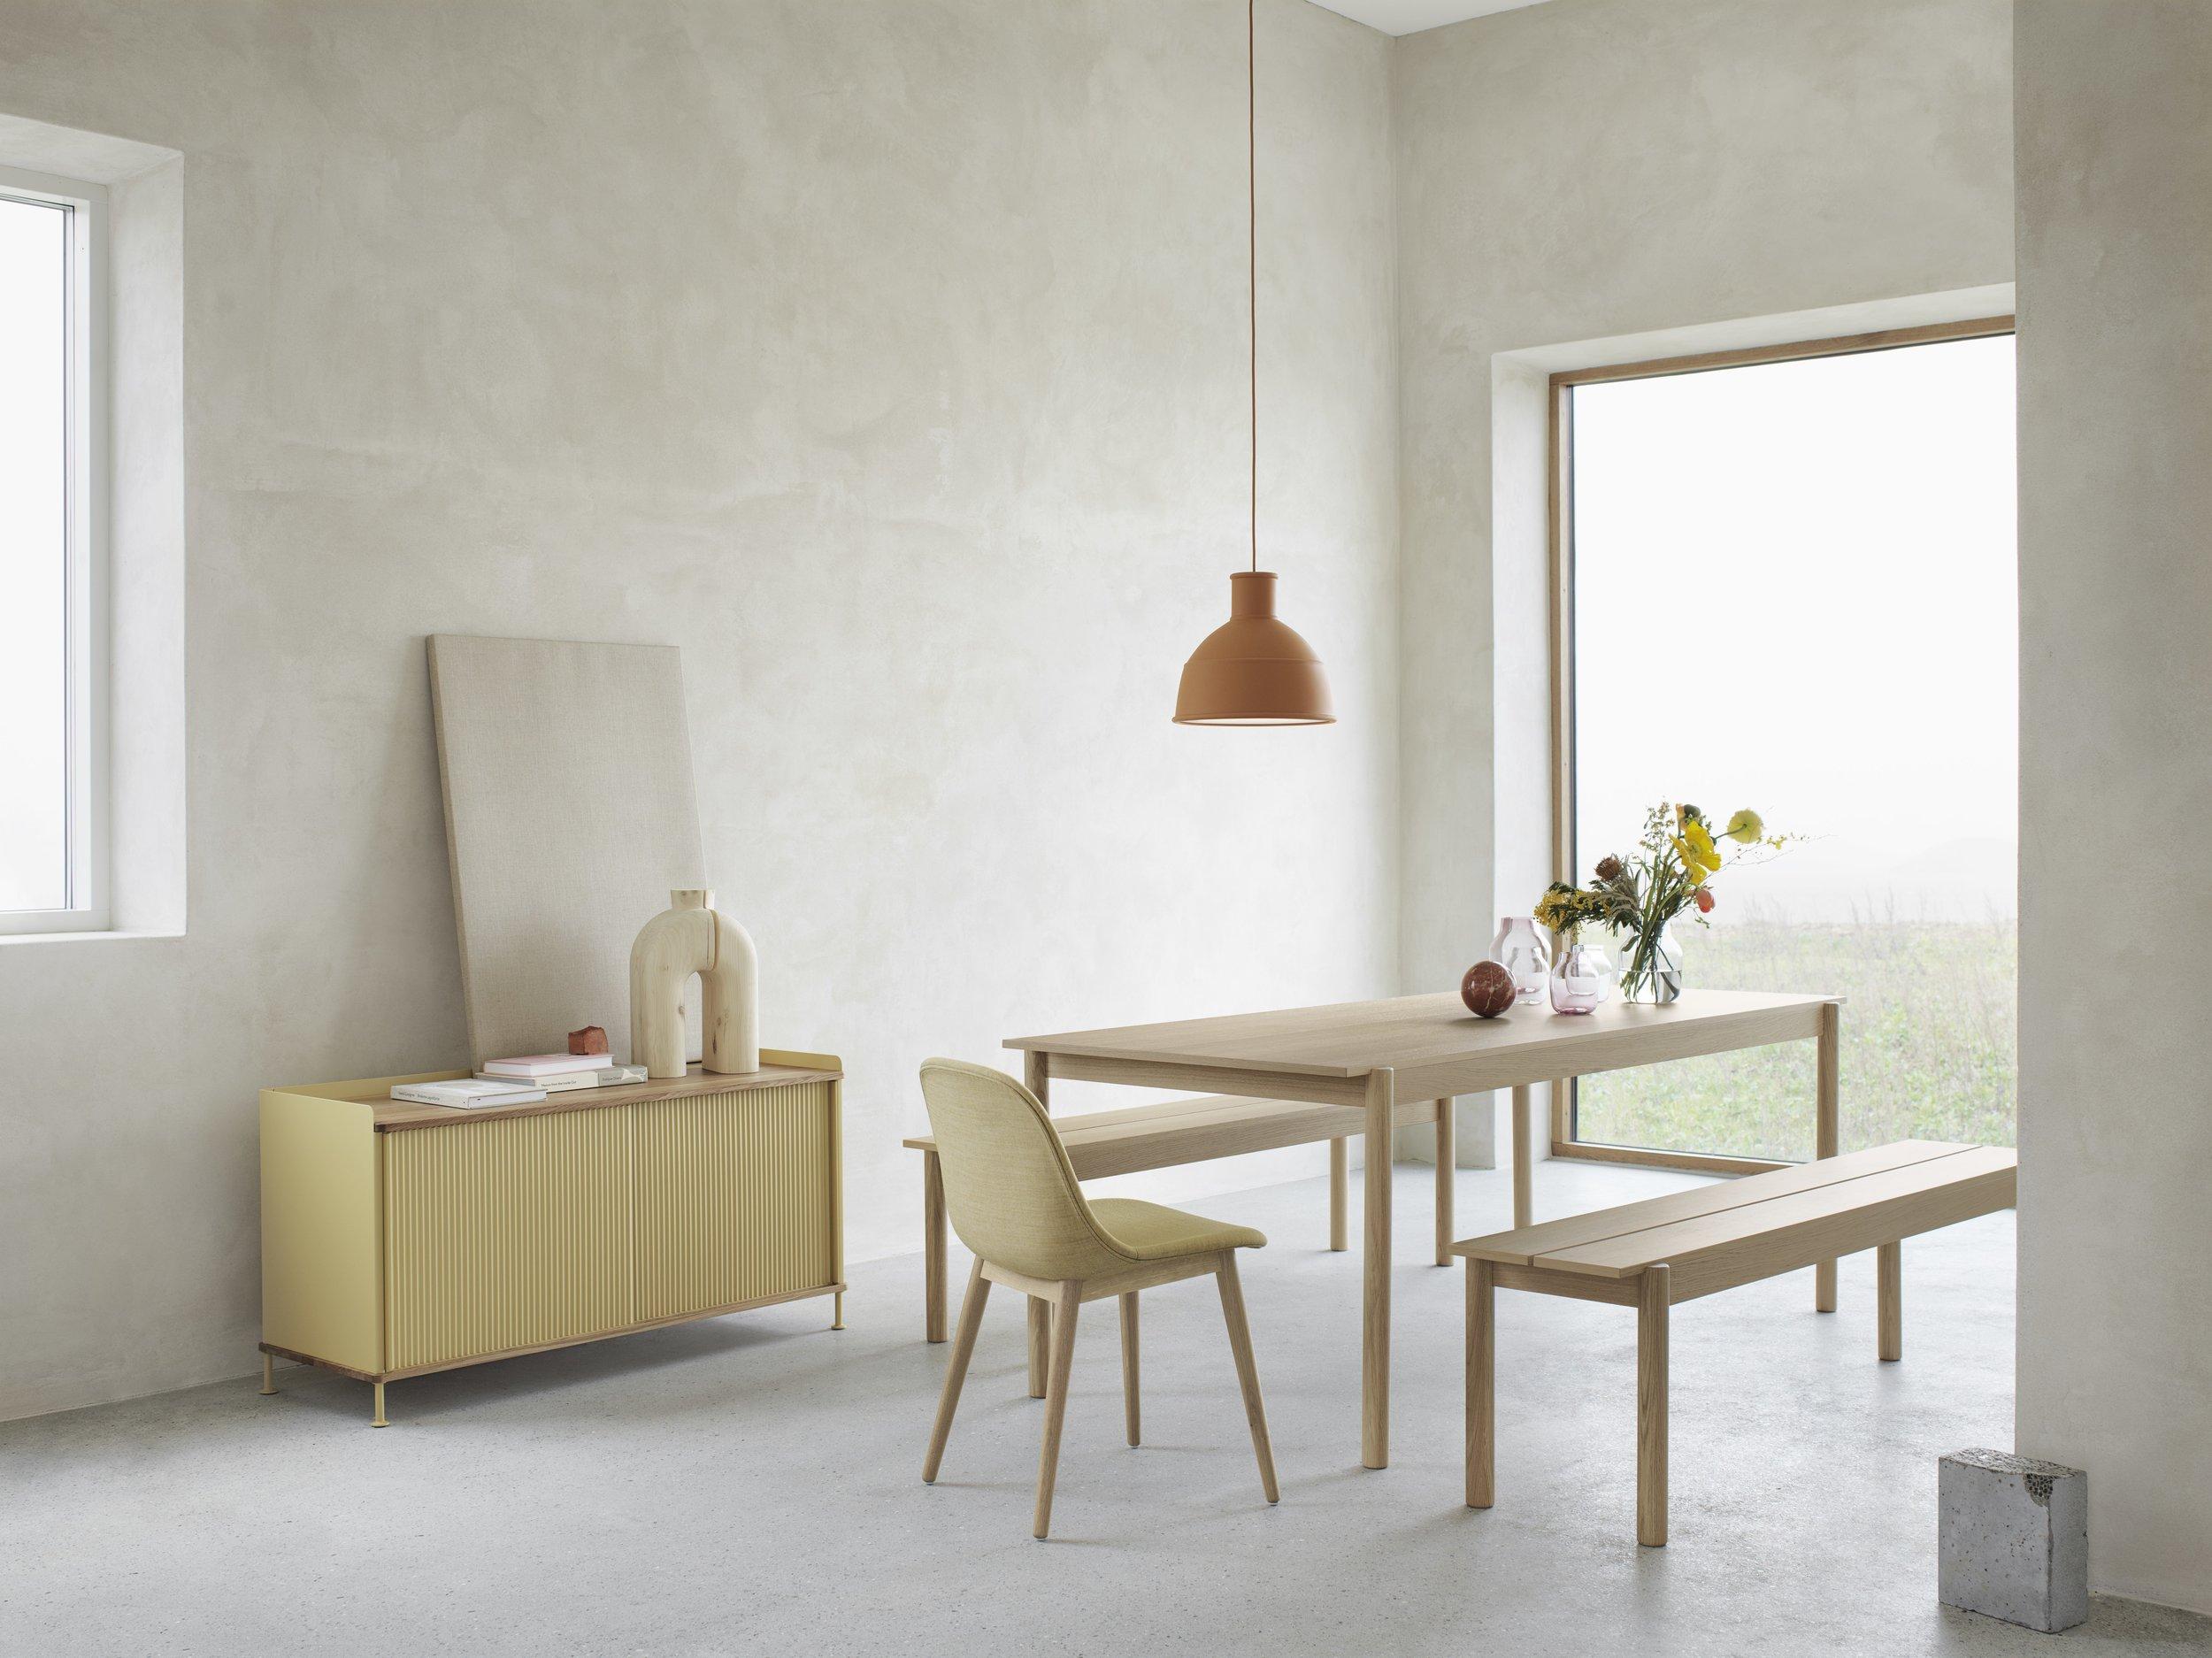 Linear Wood Table - 設計師 THOMAS BENTZEN 所設計的作品。線性的木表展現出現代而低調的形式,保有木材特有的樸實的美感,優雅的直觀的線條細節,為木制傢俱帶來了簡單而優雅的視角,帶來溫暖友好的情感,微妙的設計將木材轉化輕盈優雅的鮮明特點,將現代主義與傳統的設計相結合,堪稱為現代斯堪的納維亞設計。